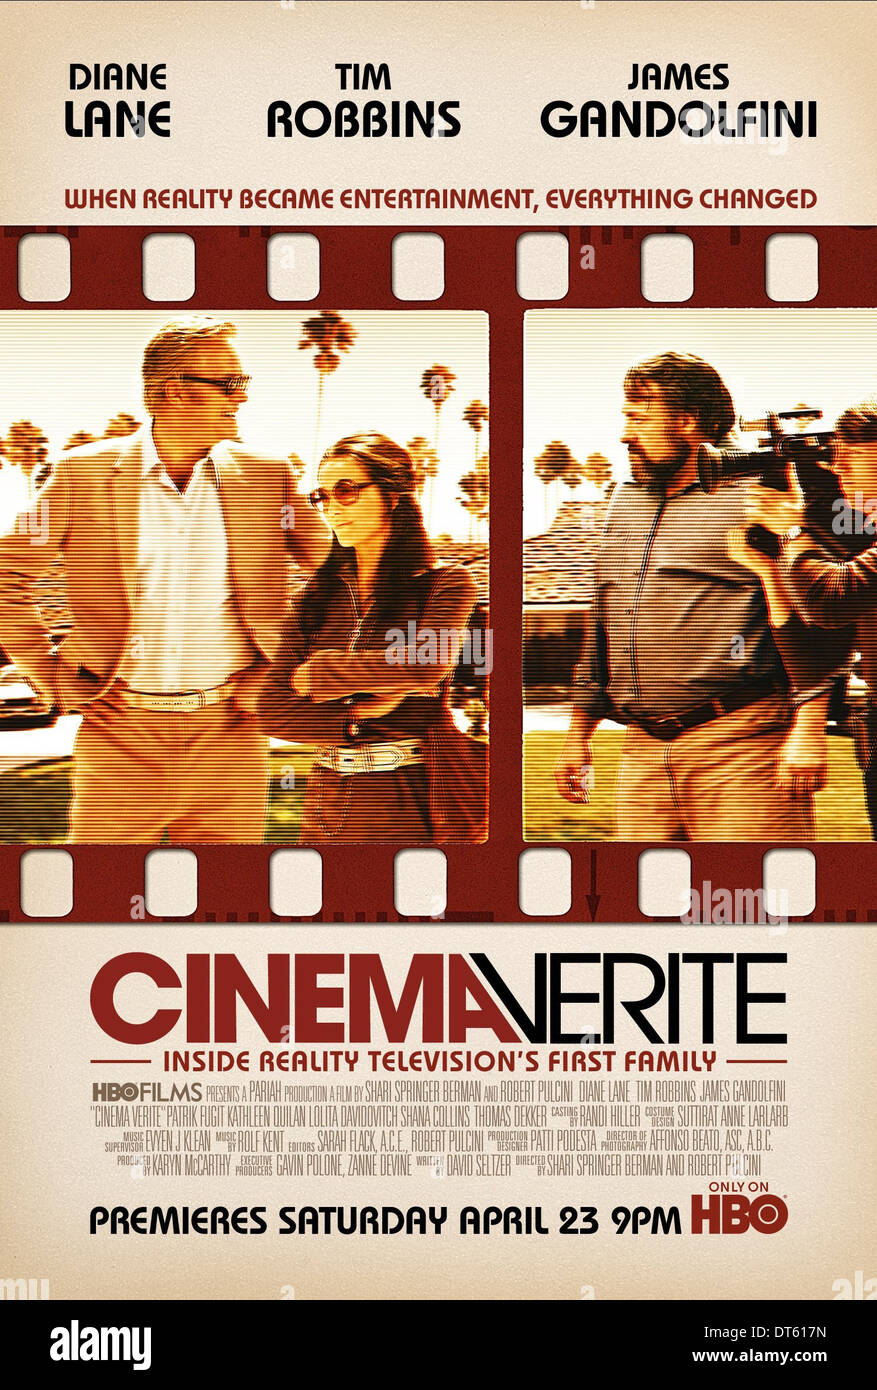 TIM ROBBINS DIANE LANE & JAMES GANDOLFINI POSTER CINEMA VERITE (2011) - Stock Image